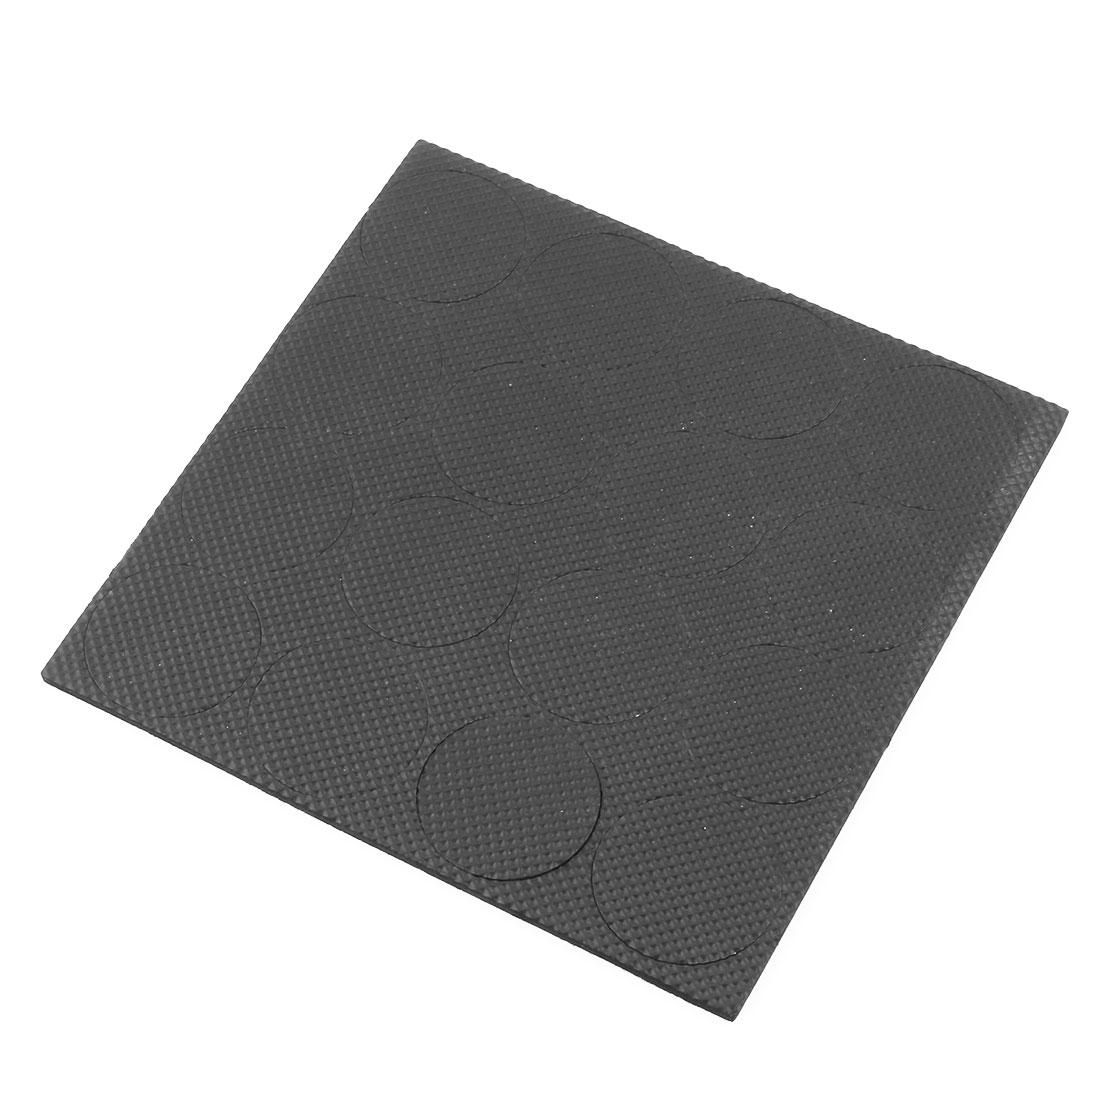 Furniture Rubber Round Anti Slip Protector Self Adhesive Pads Mats Black 16pcs